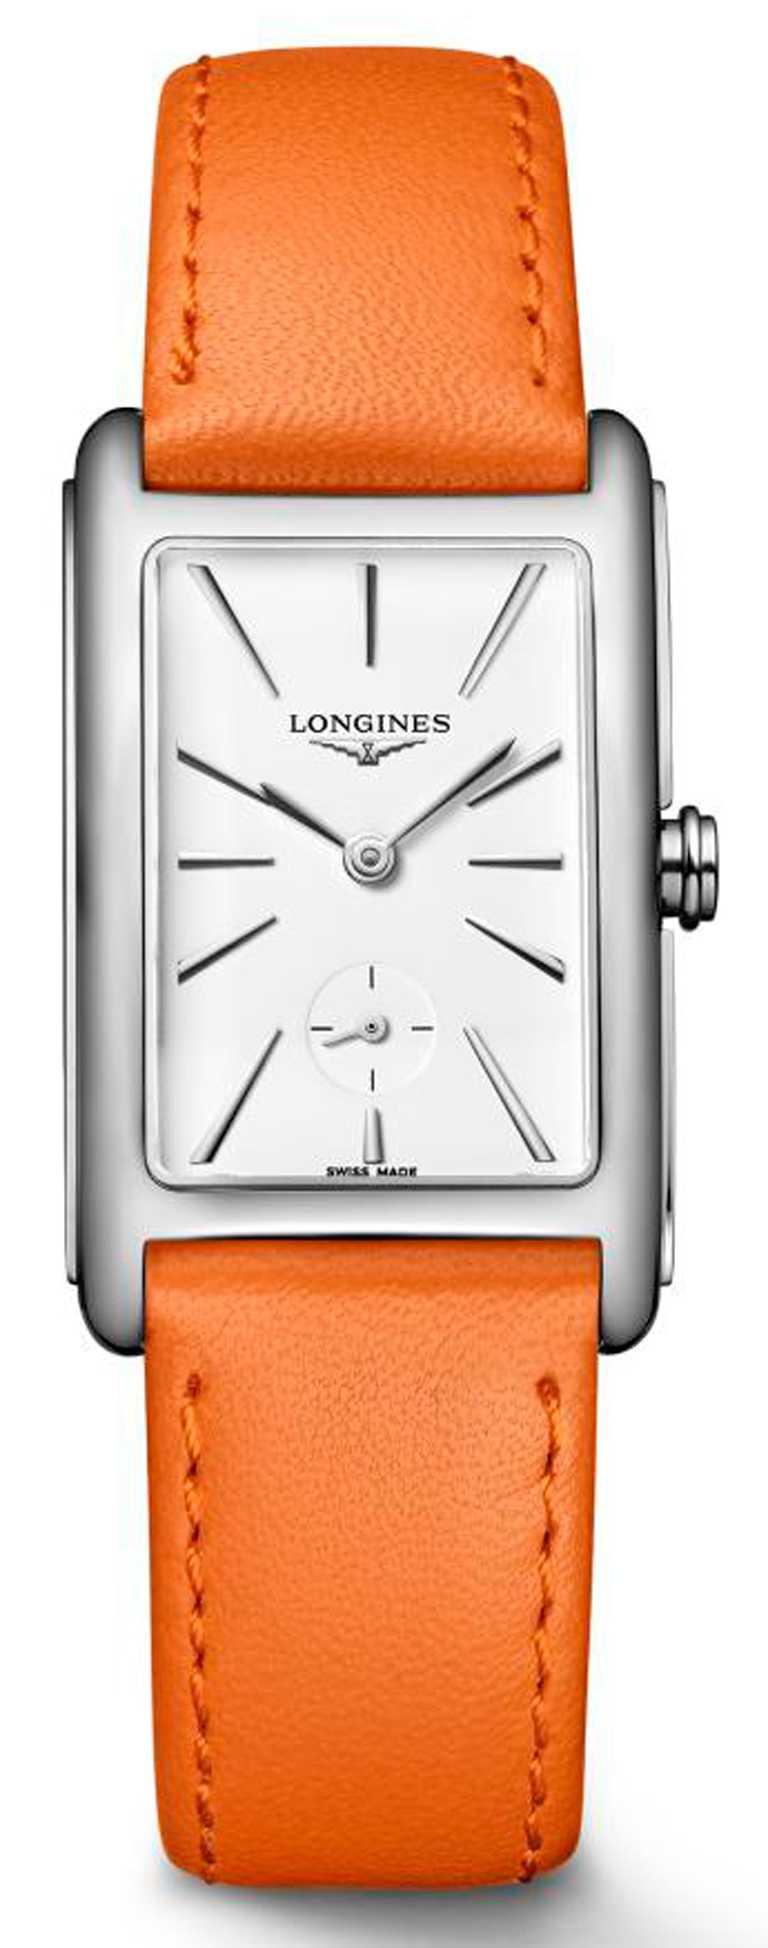 LONGINES「DolceVita多情」系列,白色面盤女士腕錶,不鏽鋼錶殼,23.3 x 37mm,石英機芯,焰橘色皮革錶帶╱38,000元。(圖╱LONGINES提供)